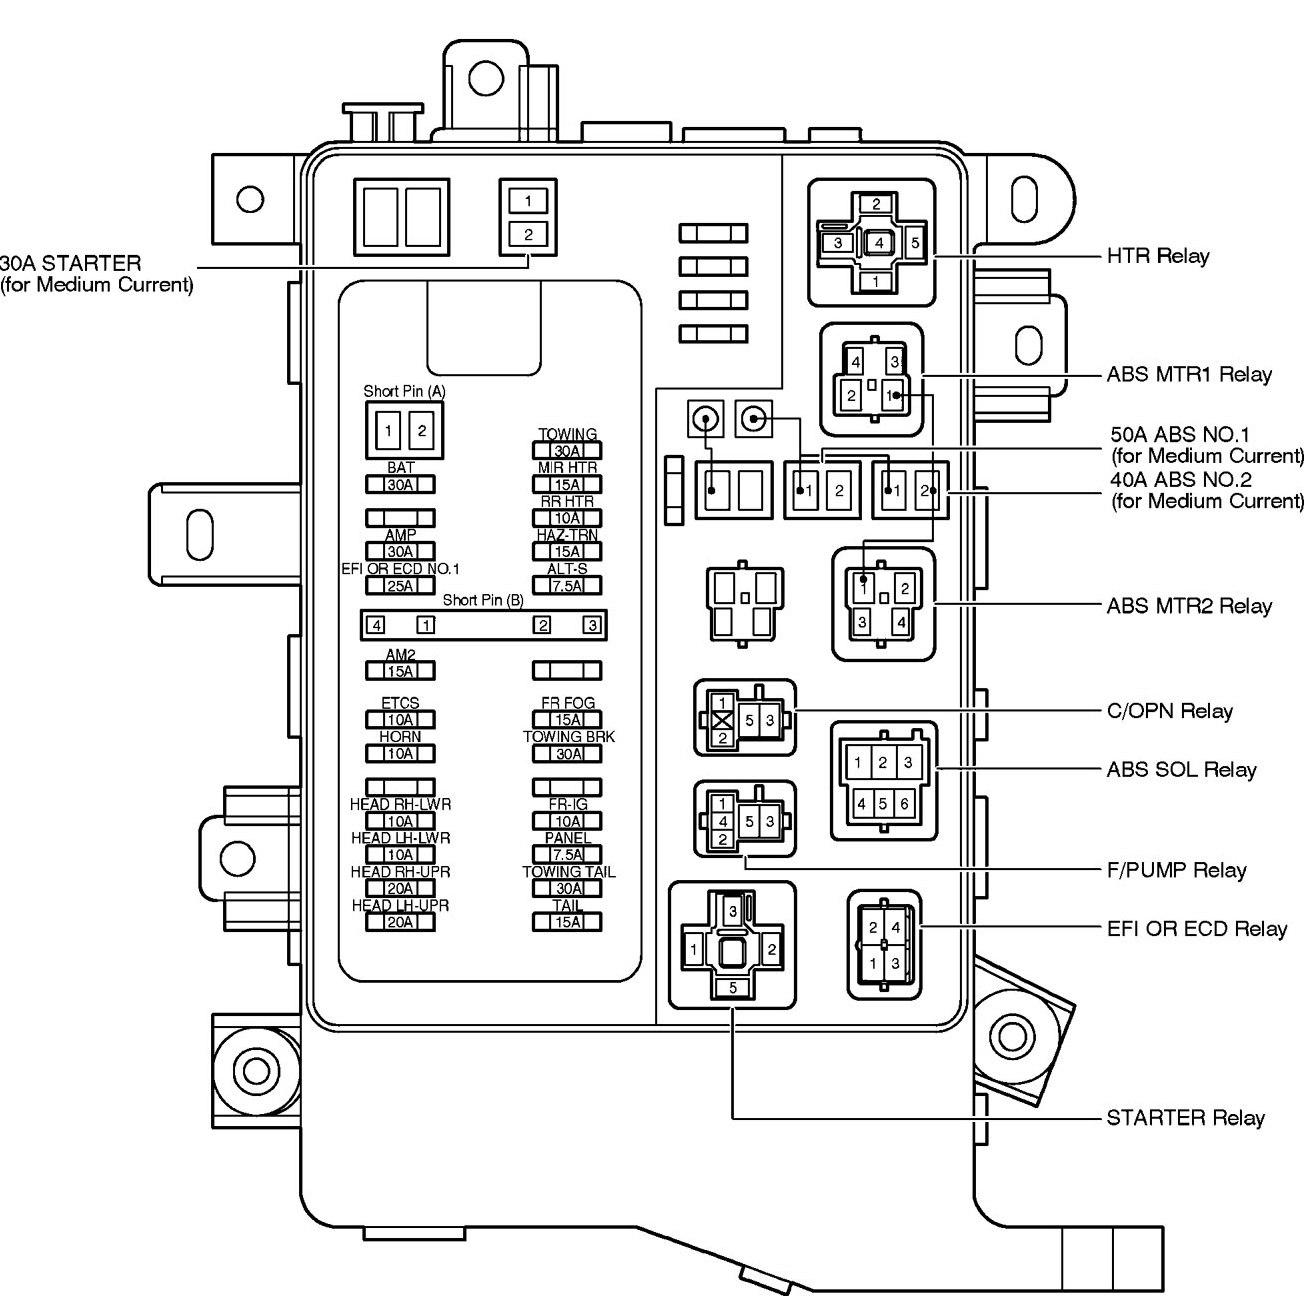 Relay Switch 2009 Pontiac G6 Fuse Box | Wiring Library